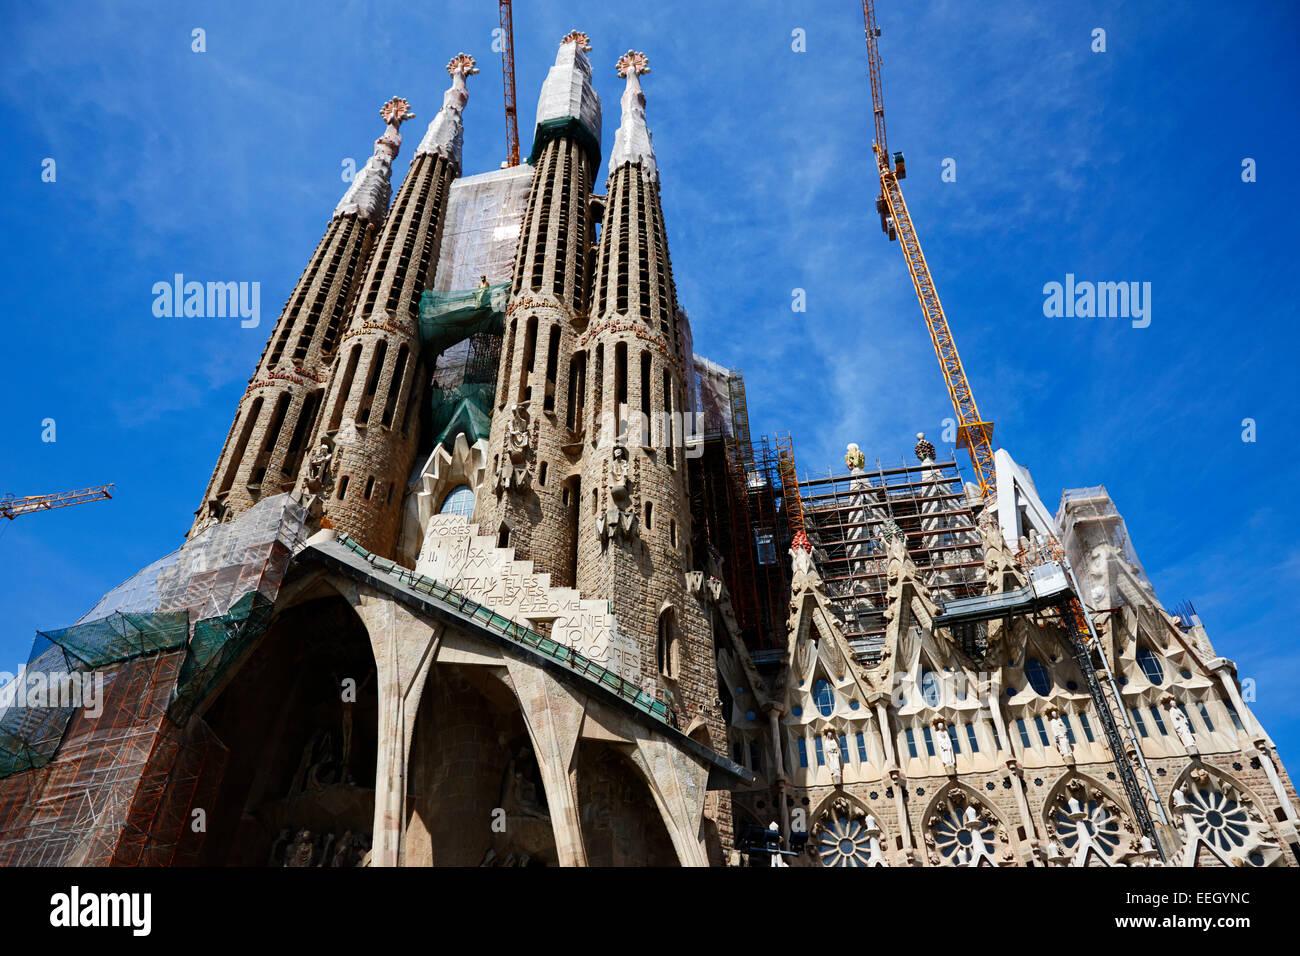 La fachada de la pasión de la Sagrada Familia Barcelona Cataluña España Imagen De Stock